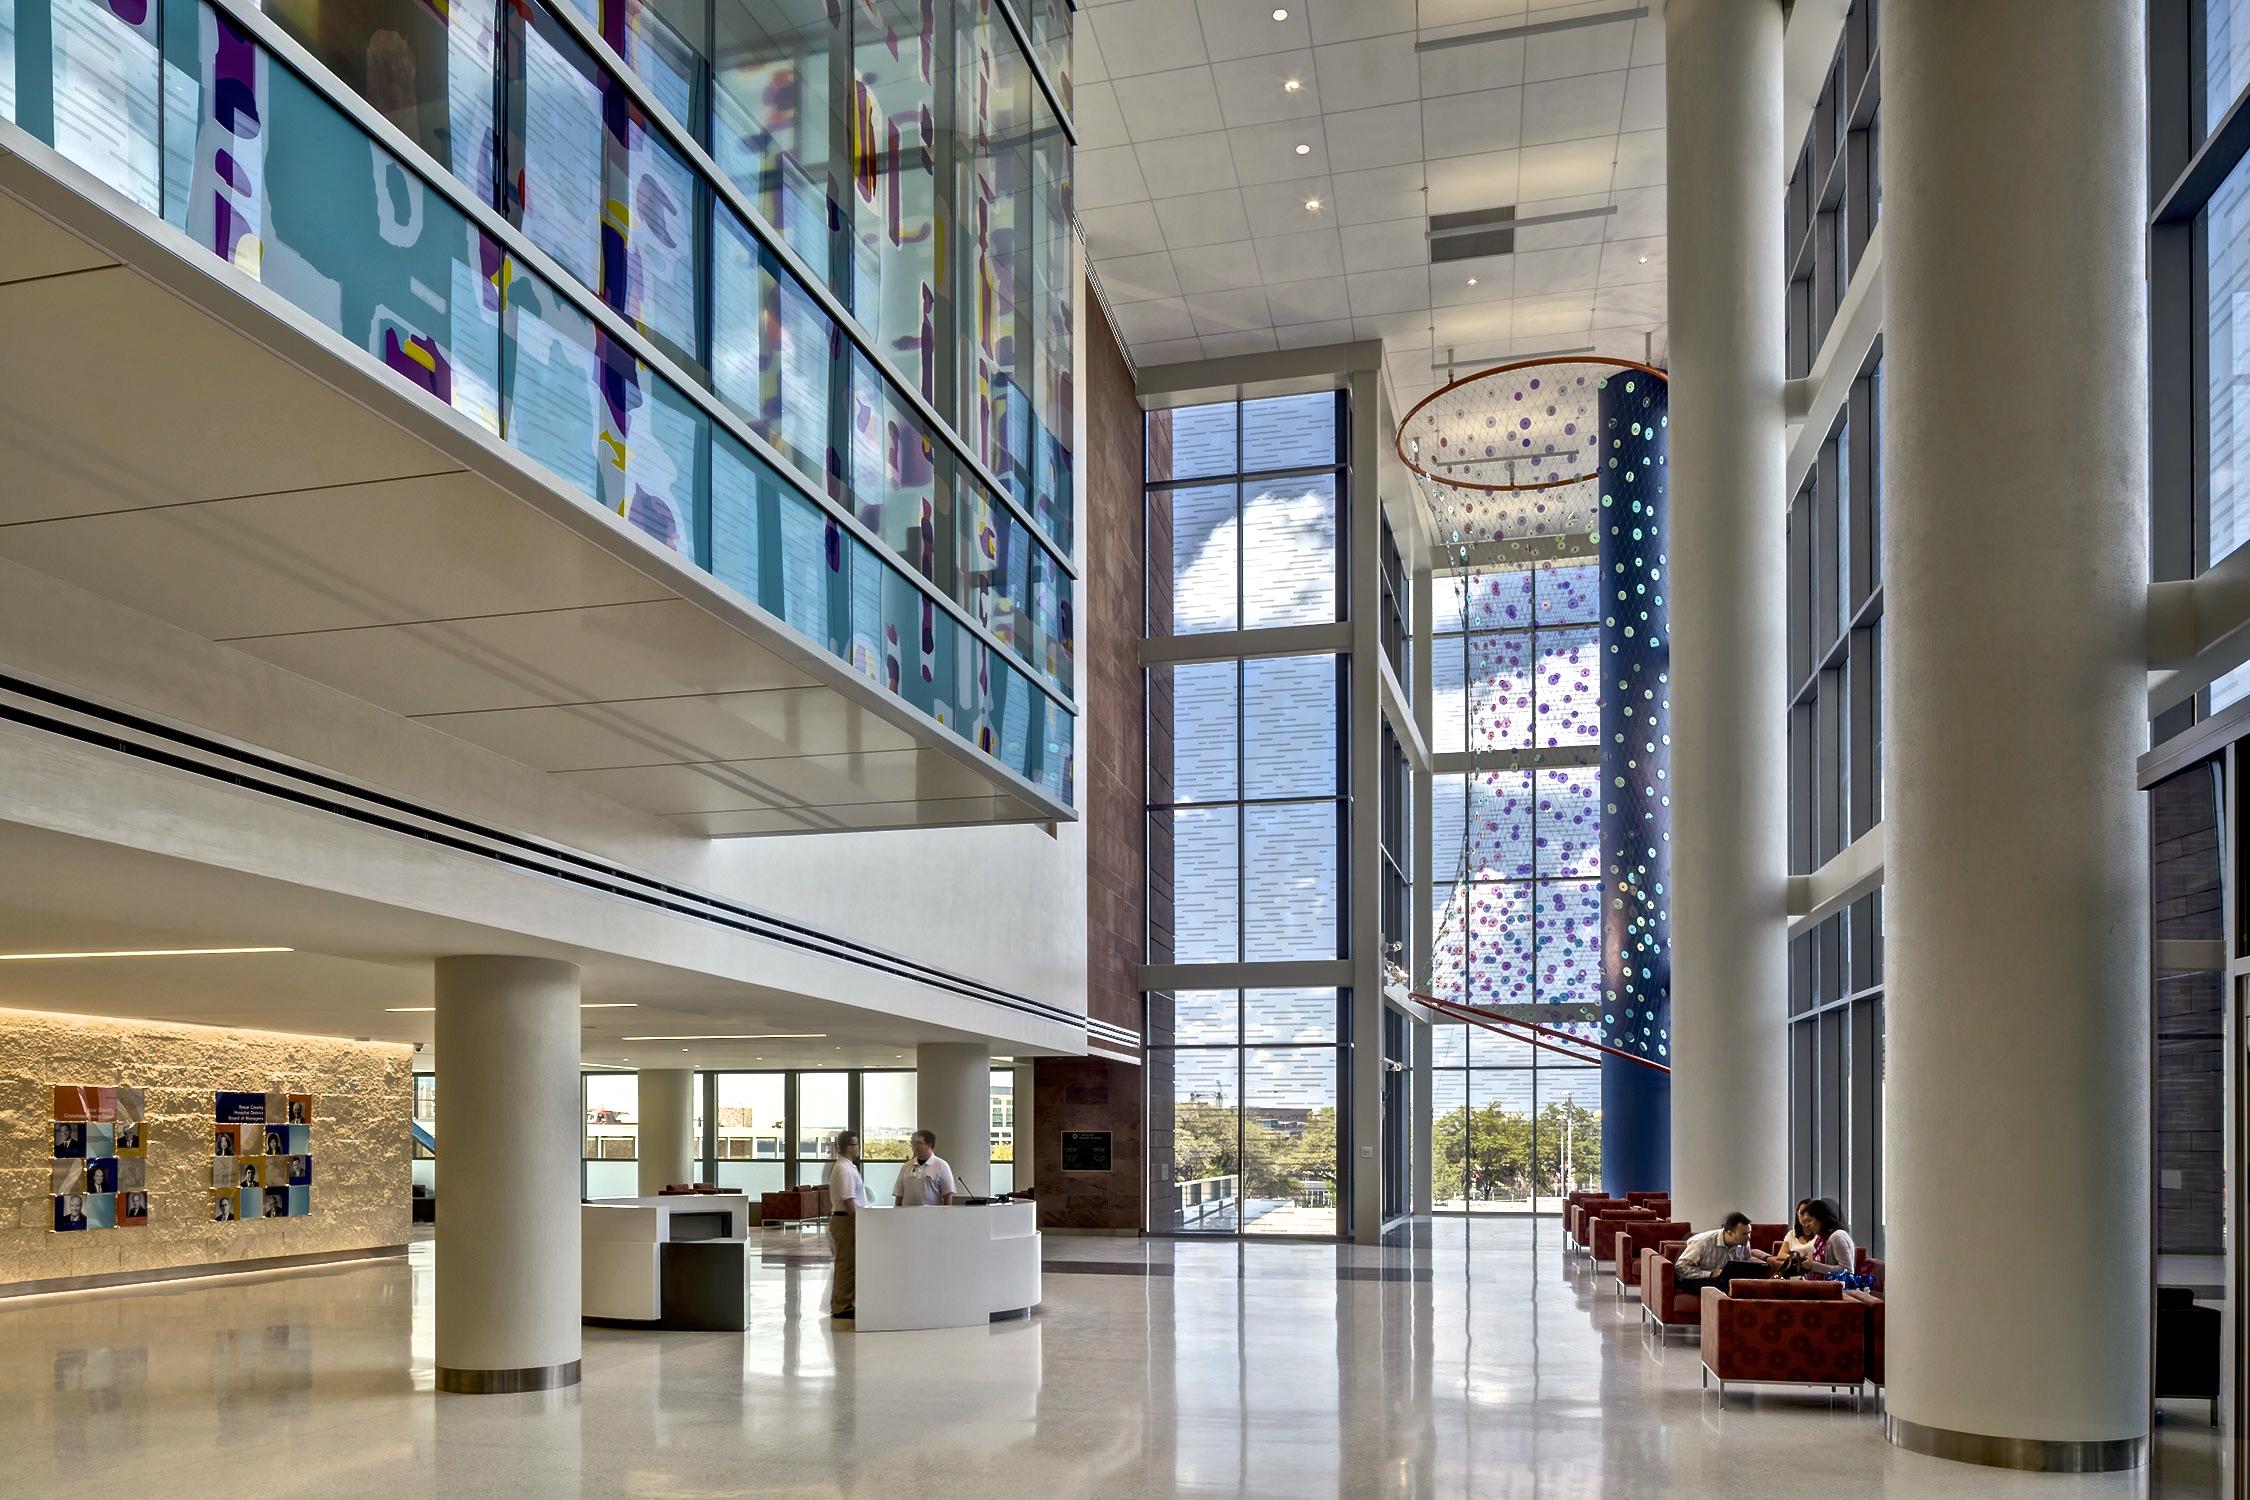 University Health System - San Antonio